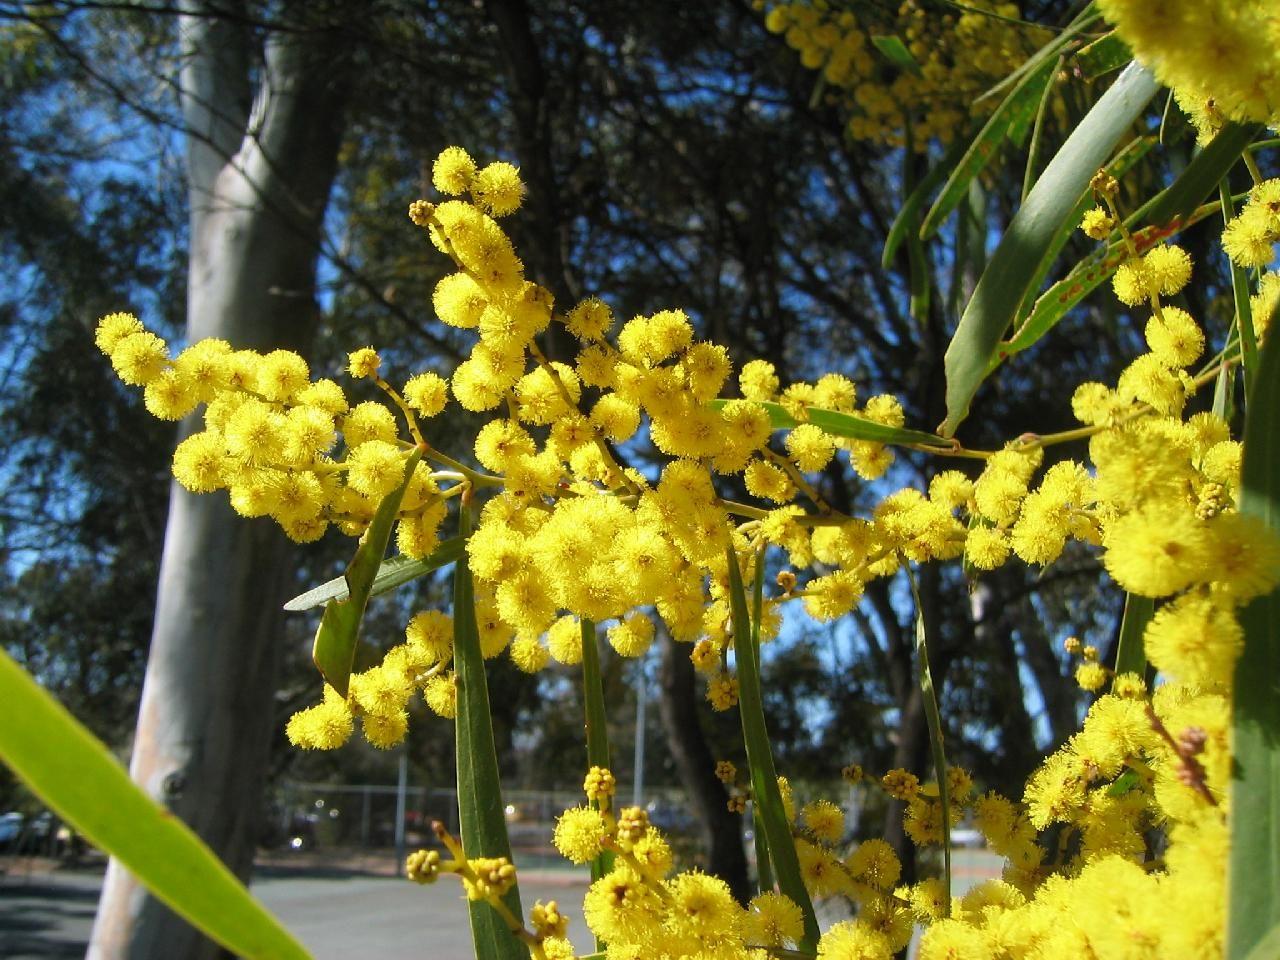 Golden Wattle Australia National Flower Flowers Flowers Different Types Of Flowers Types Of Flowers Australia Wallpaper